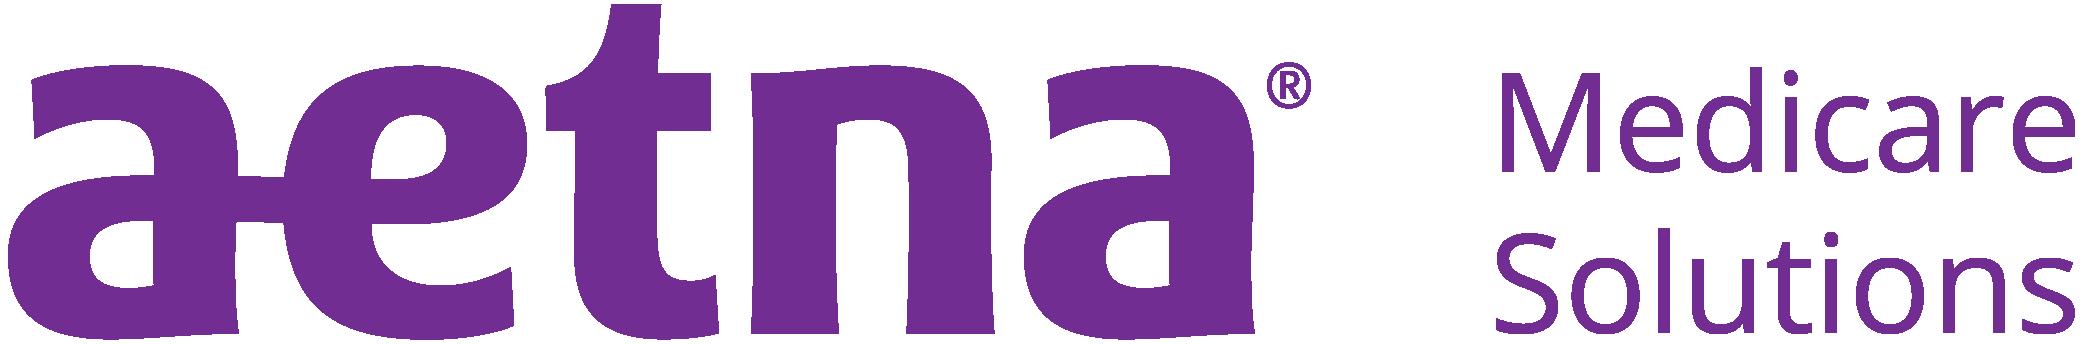 Sponsor Logos2.png